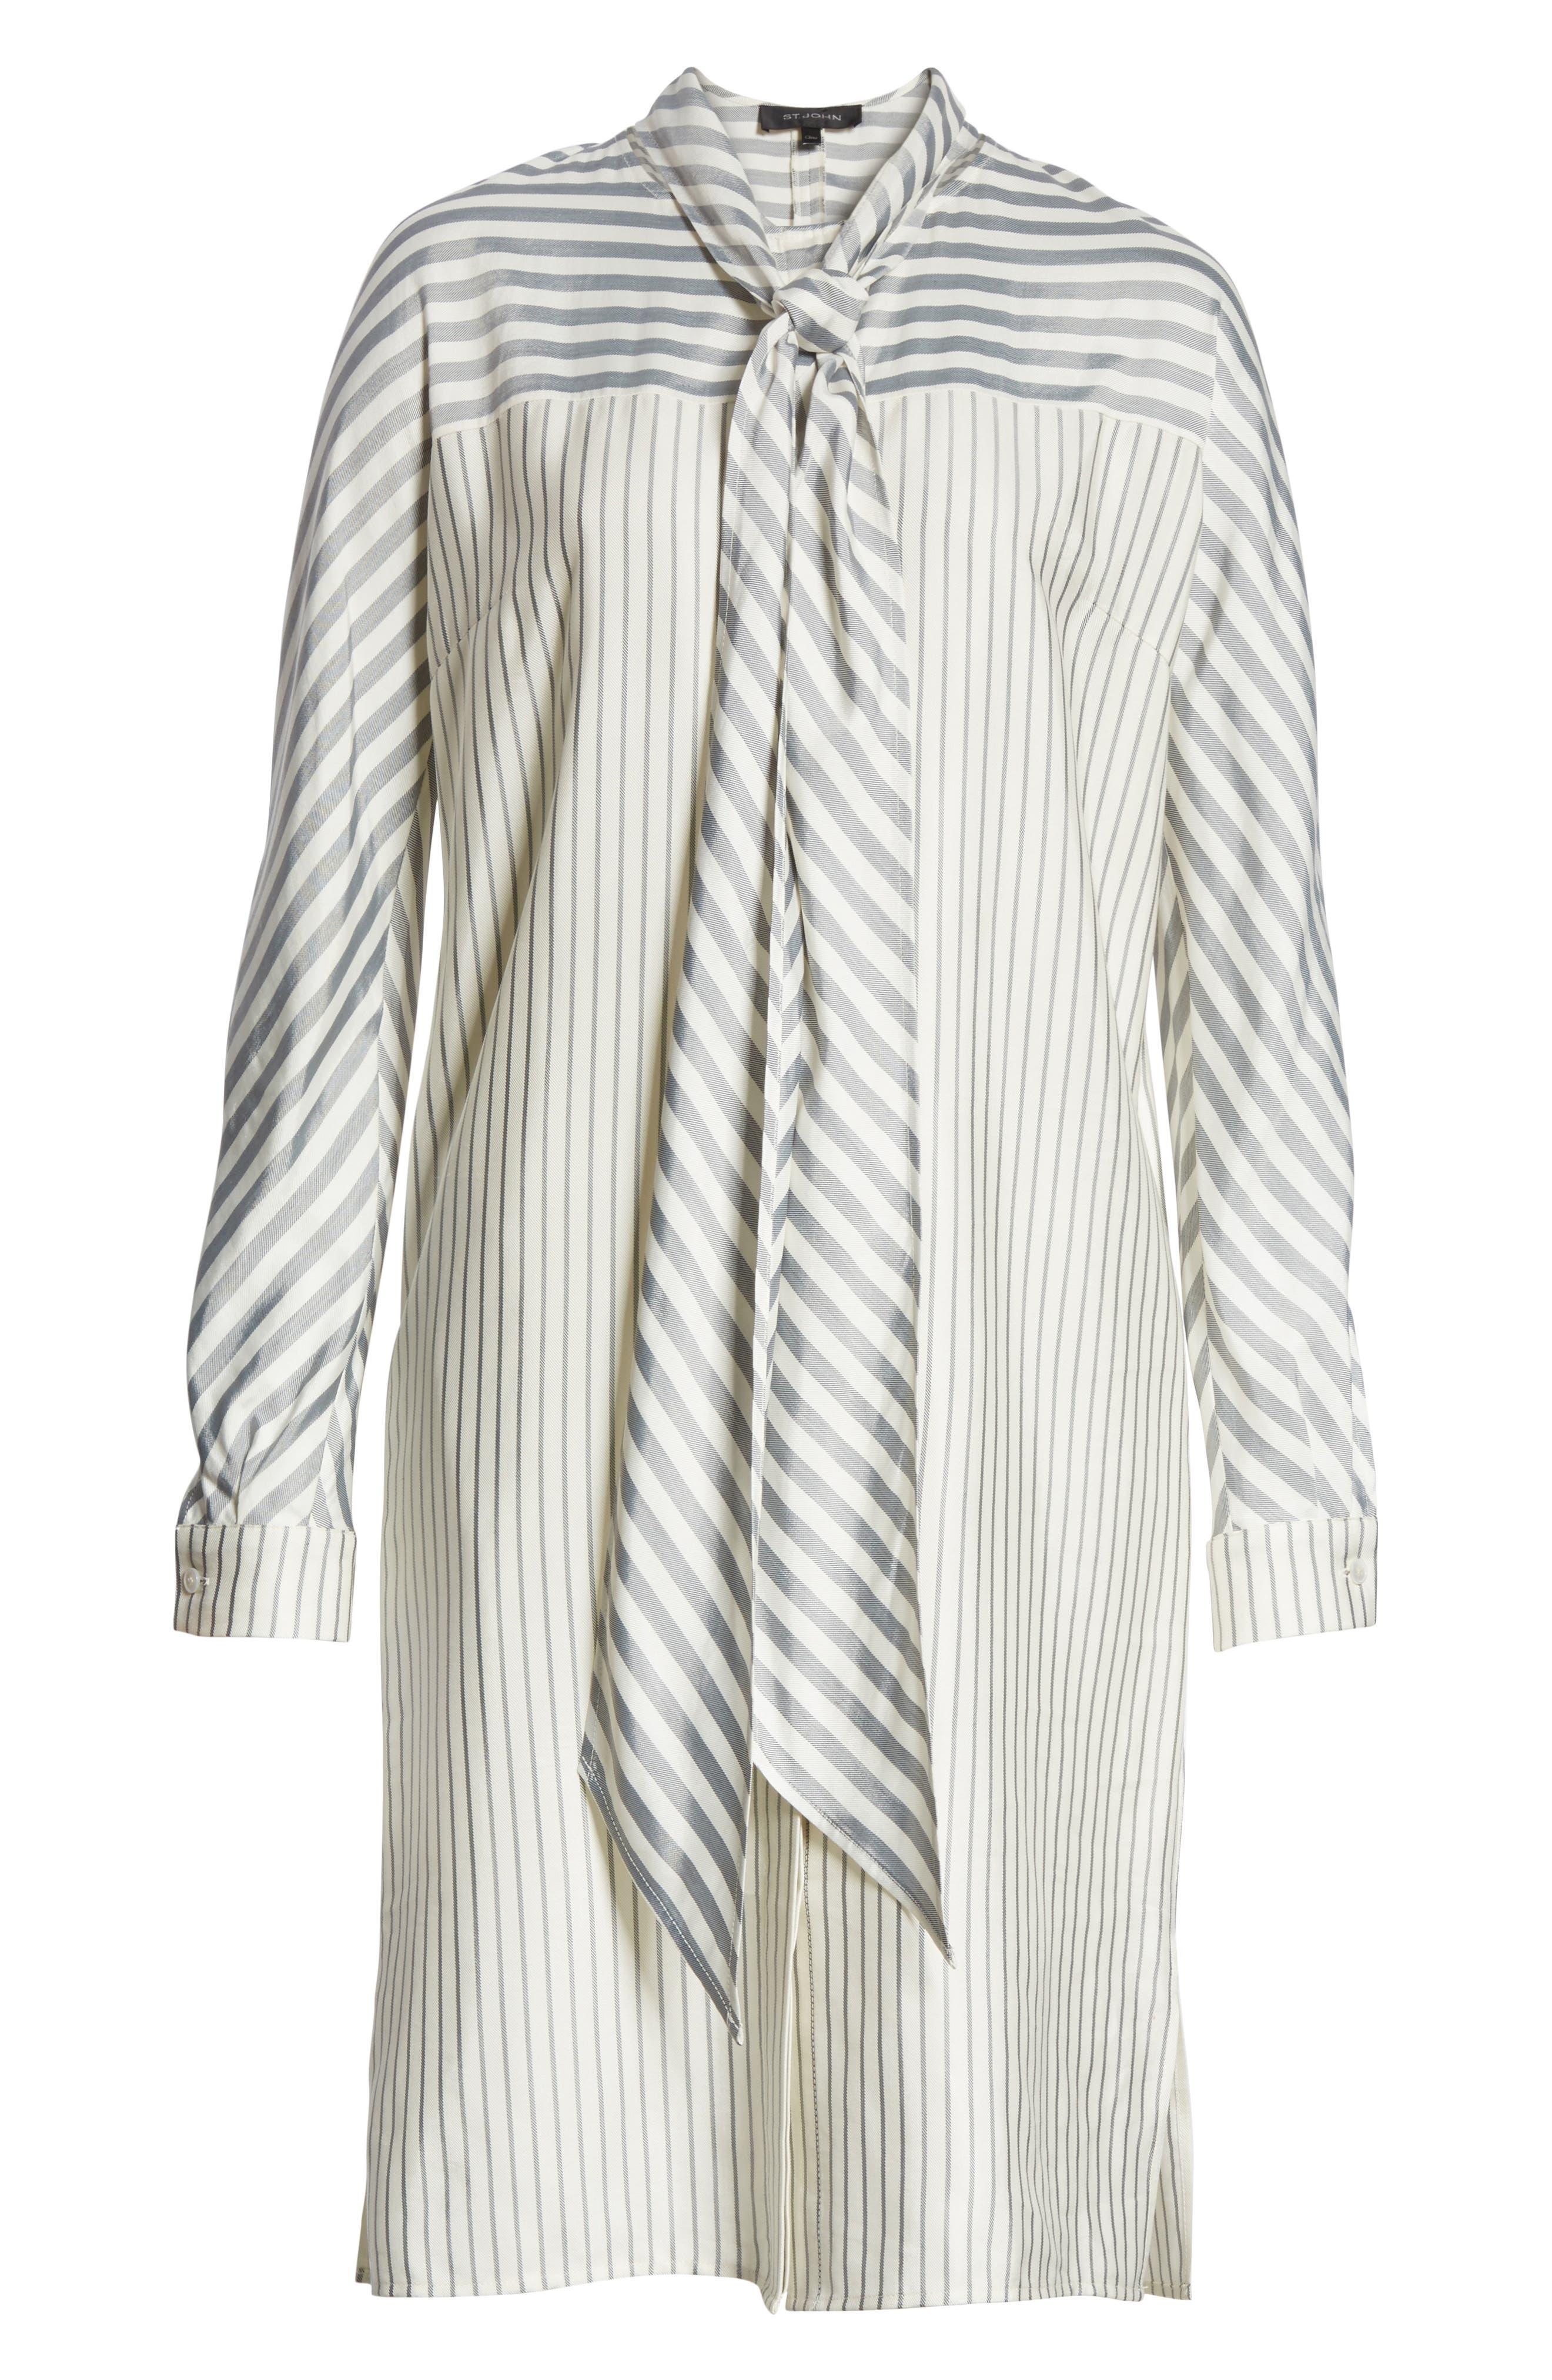 ST. JOHN COLLECTION,                             Stripe Tie Neck Shirtdress,                             Alternate thumbnail 7, color,                             900